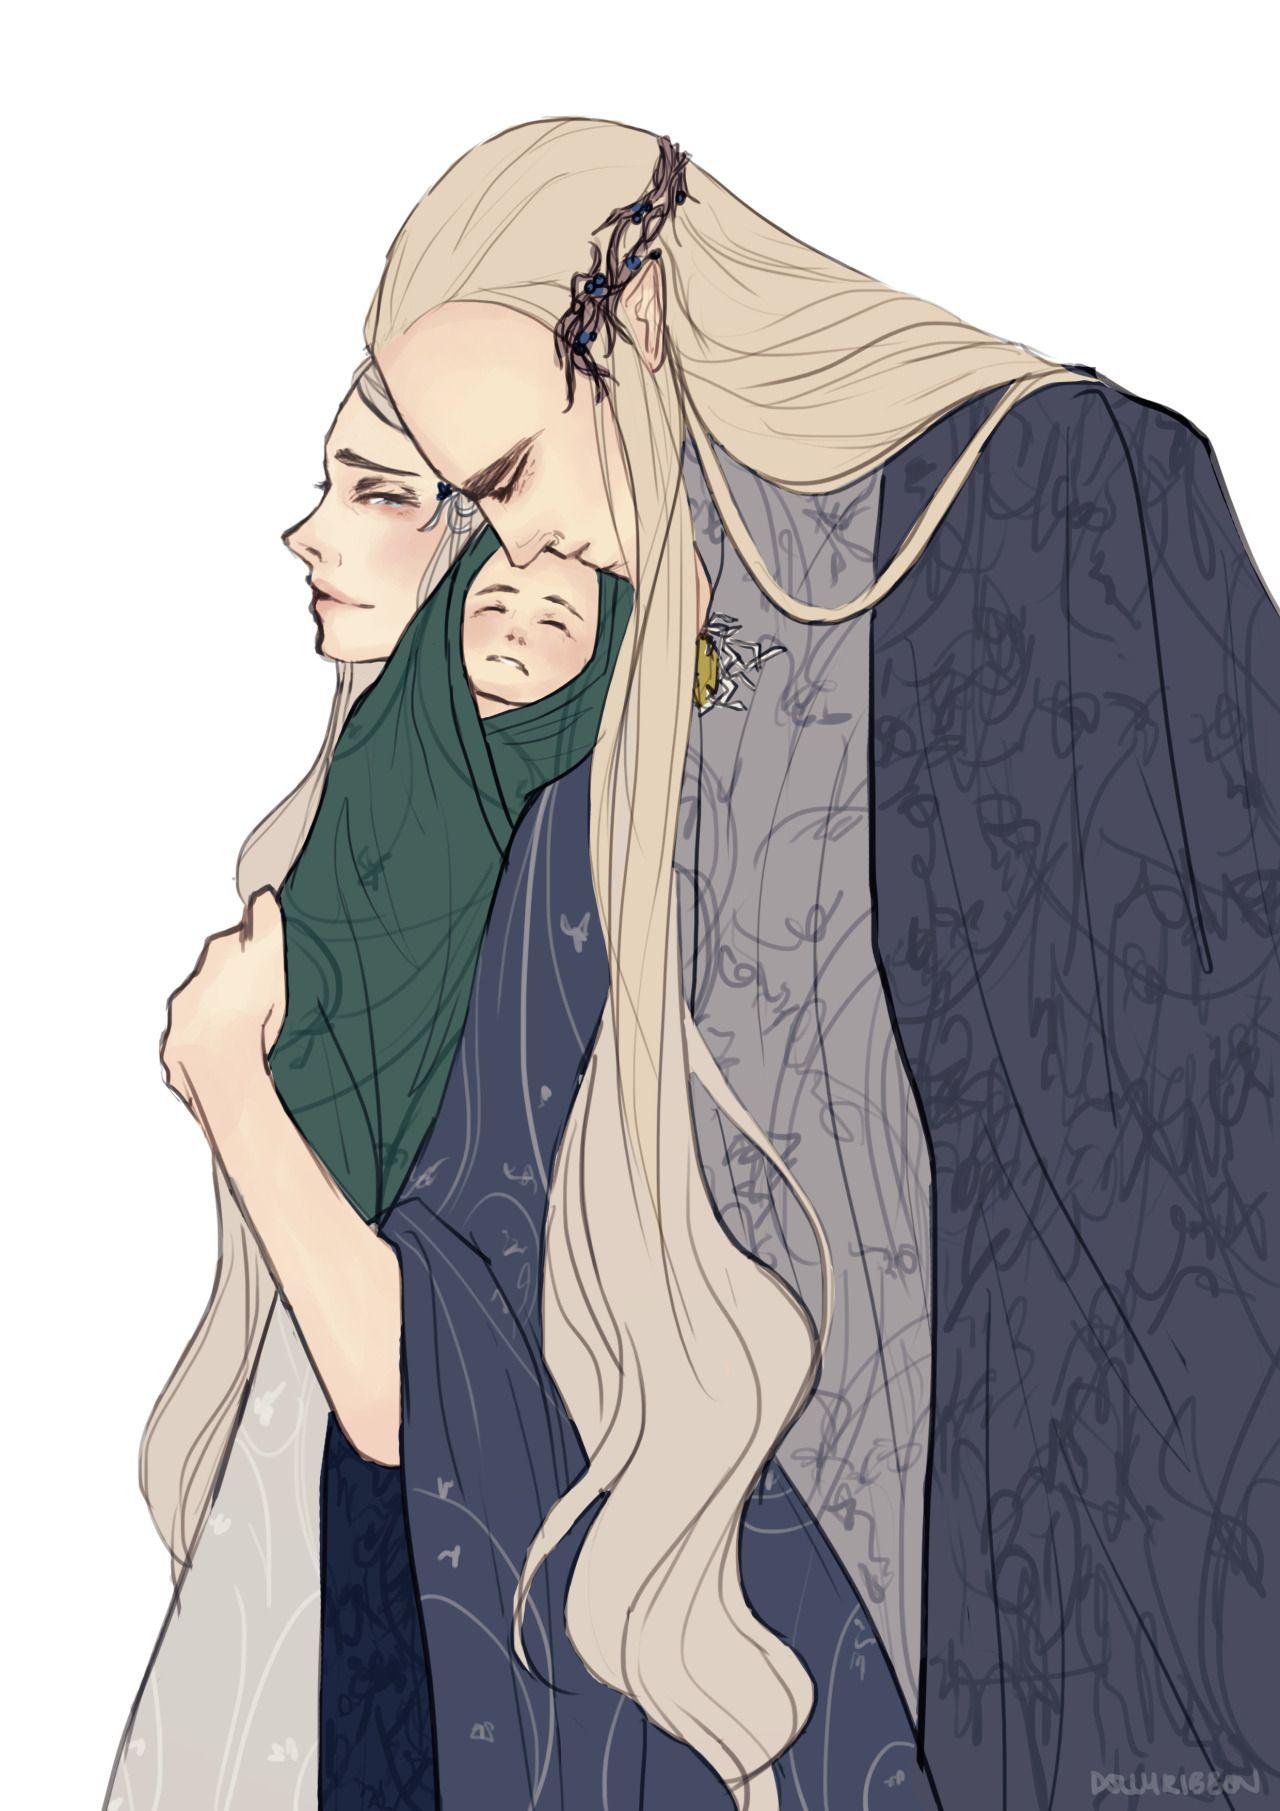 Mirkwood royal family. Legolas and Thranduil and his wife ...